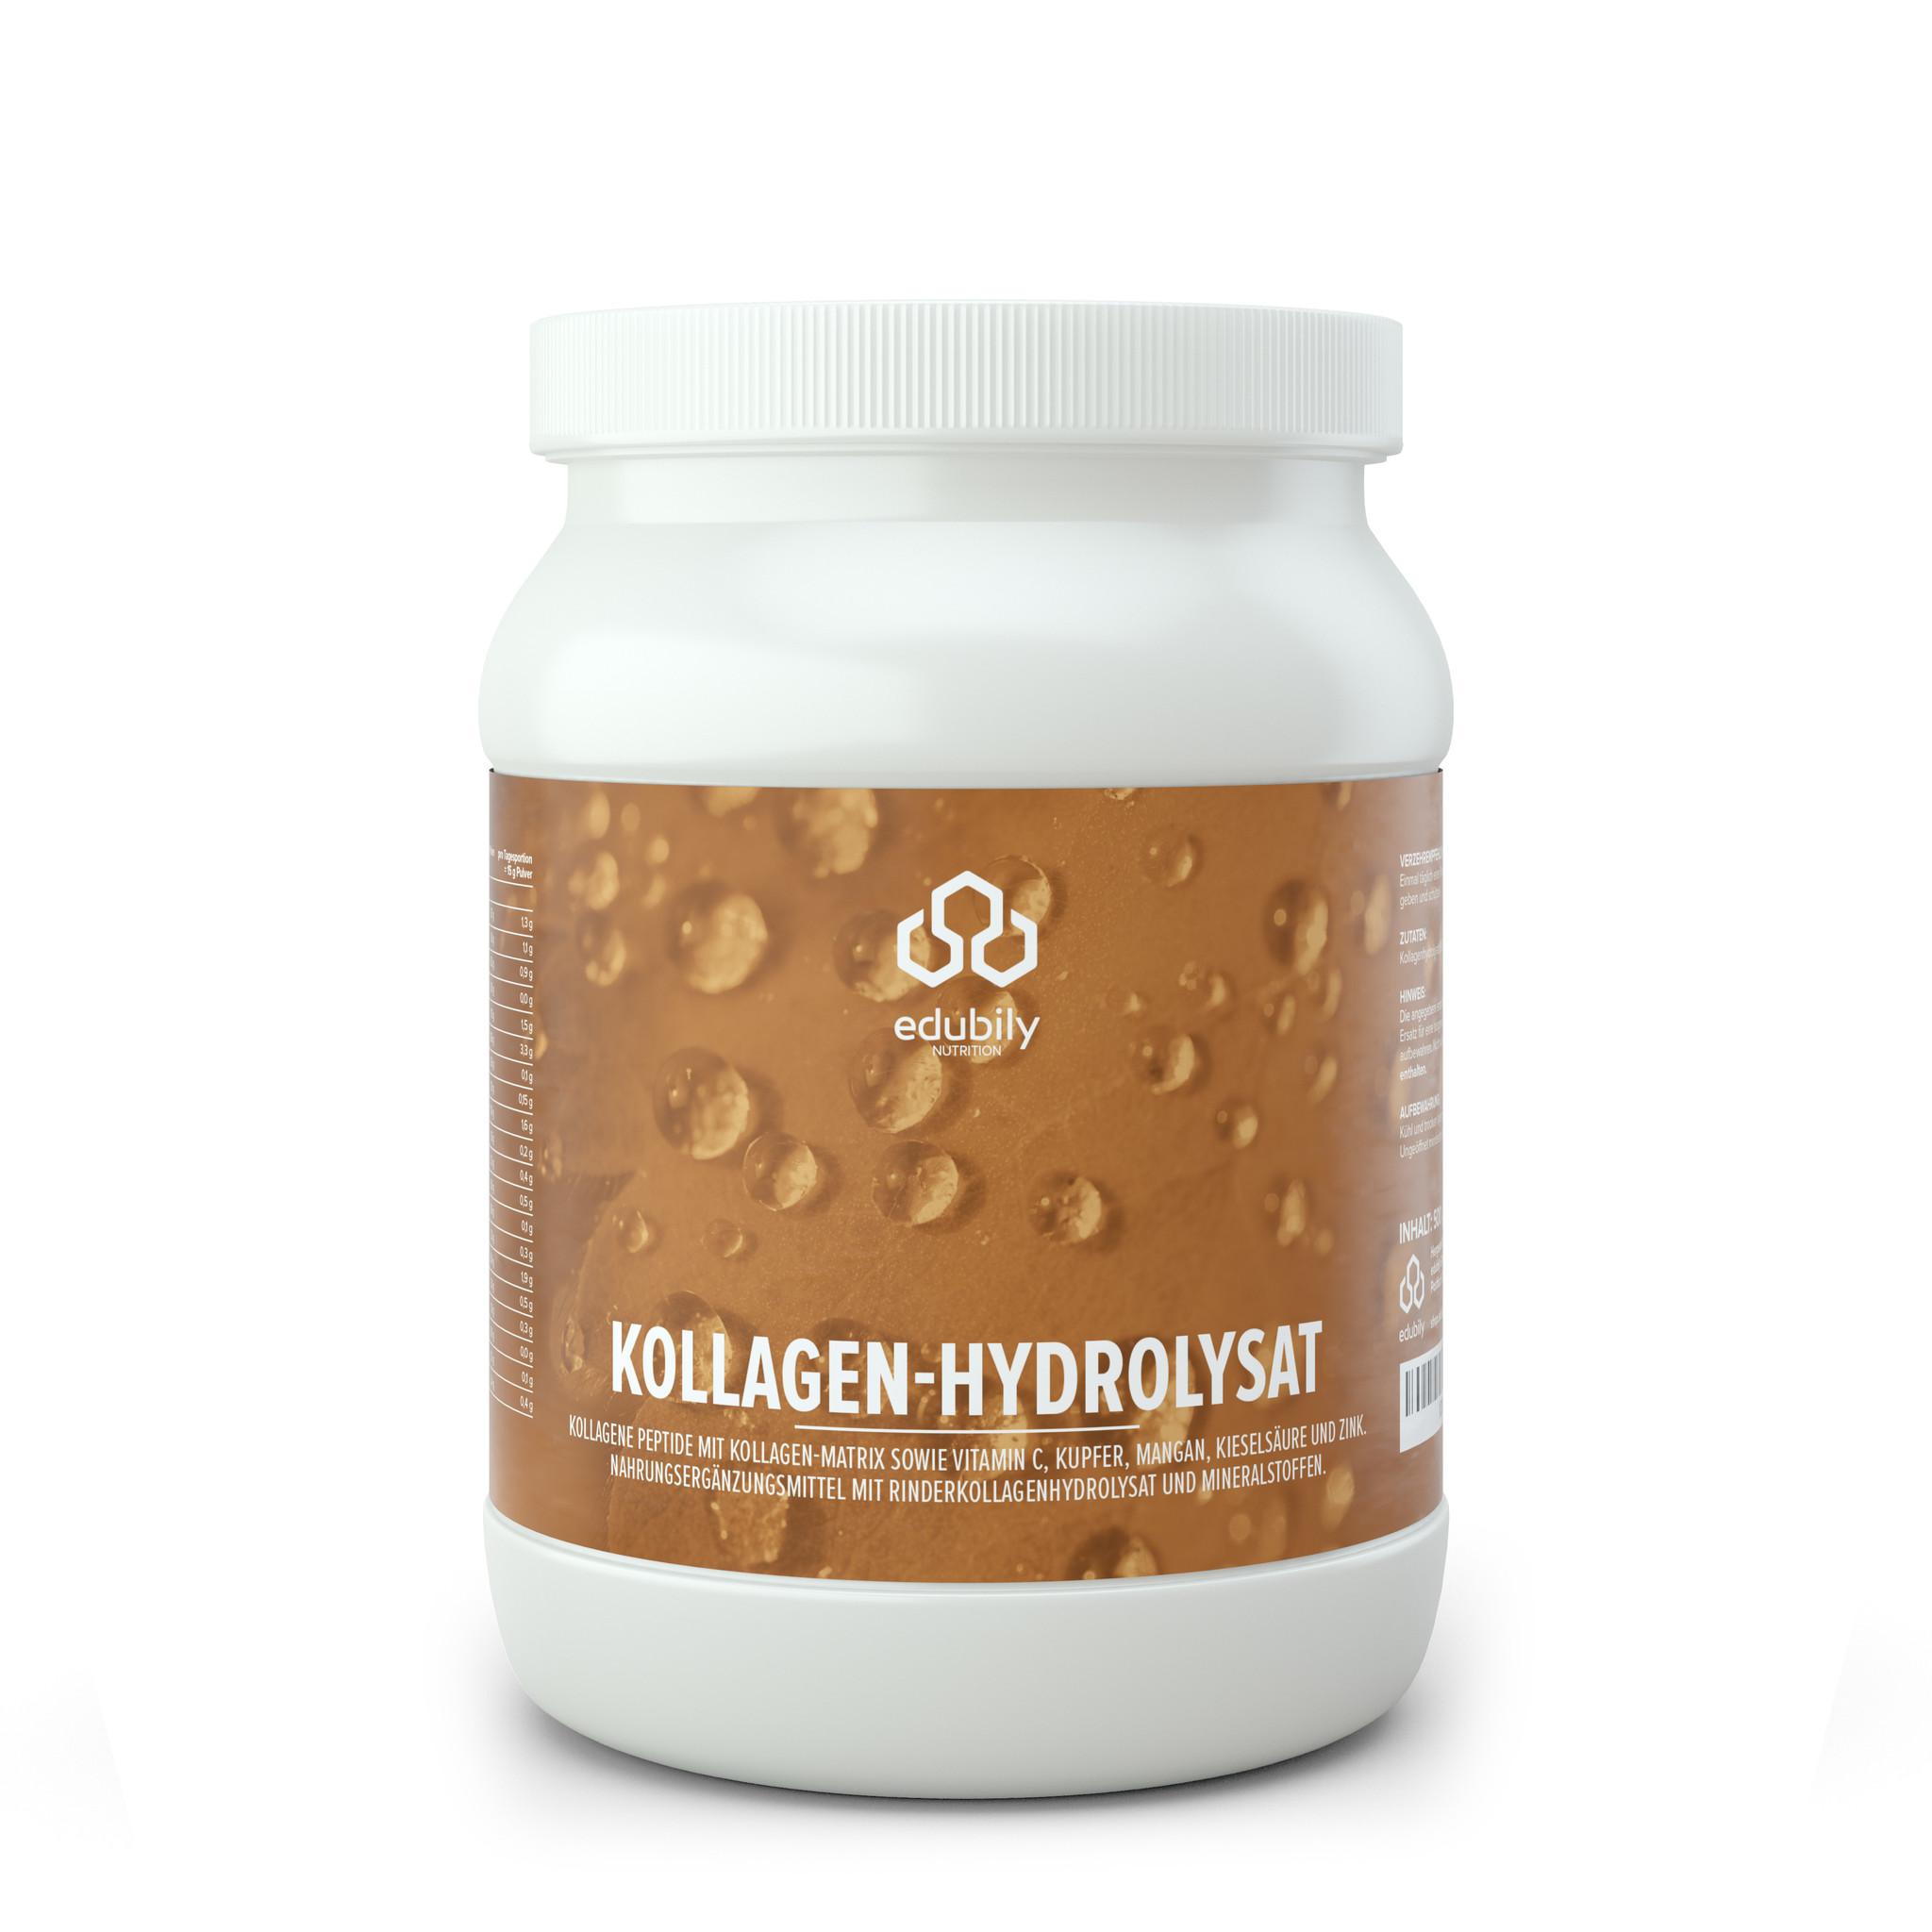 edubily Kollagen-Hydrolysat